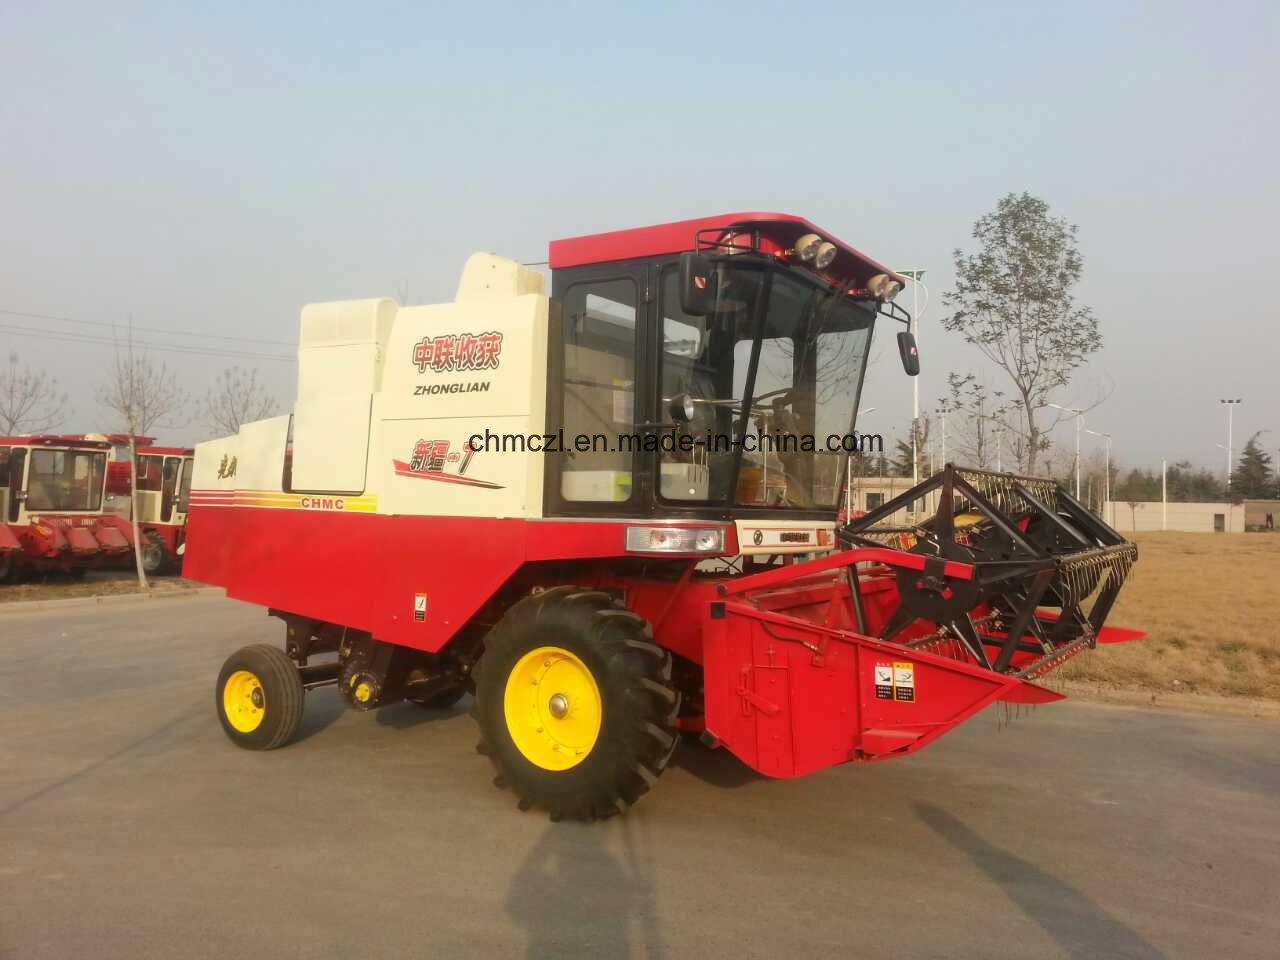 4lz-7 Customized Wheat Combine Harvester